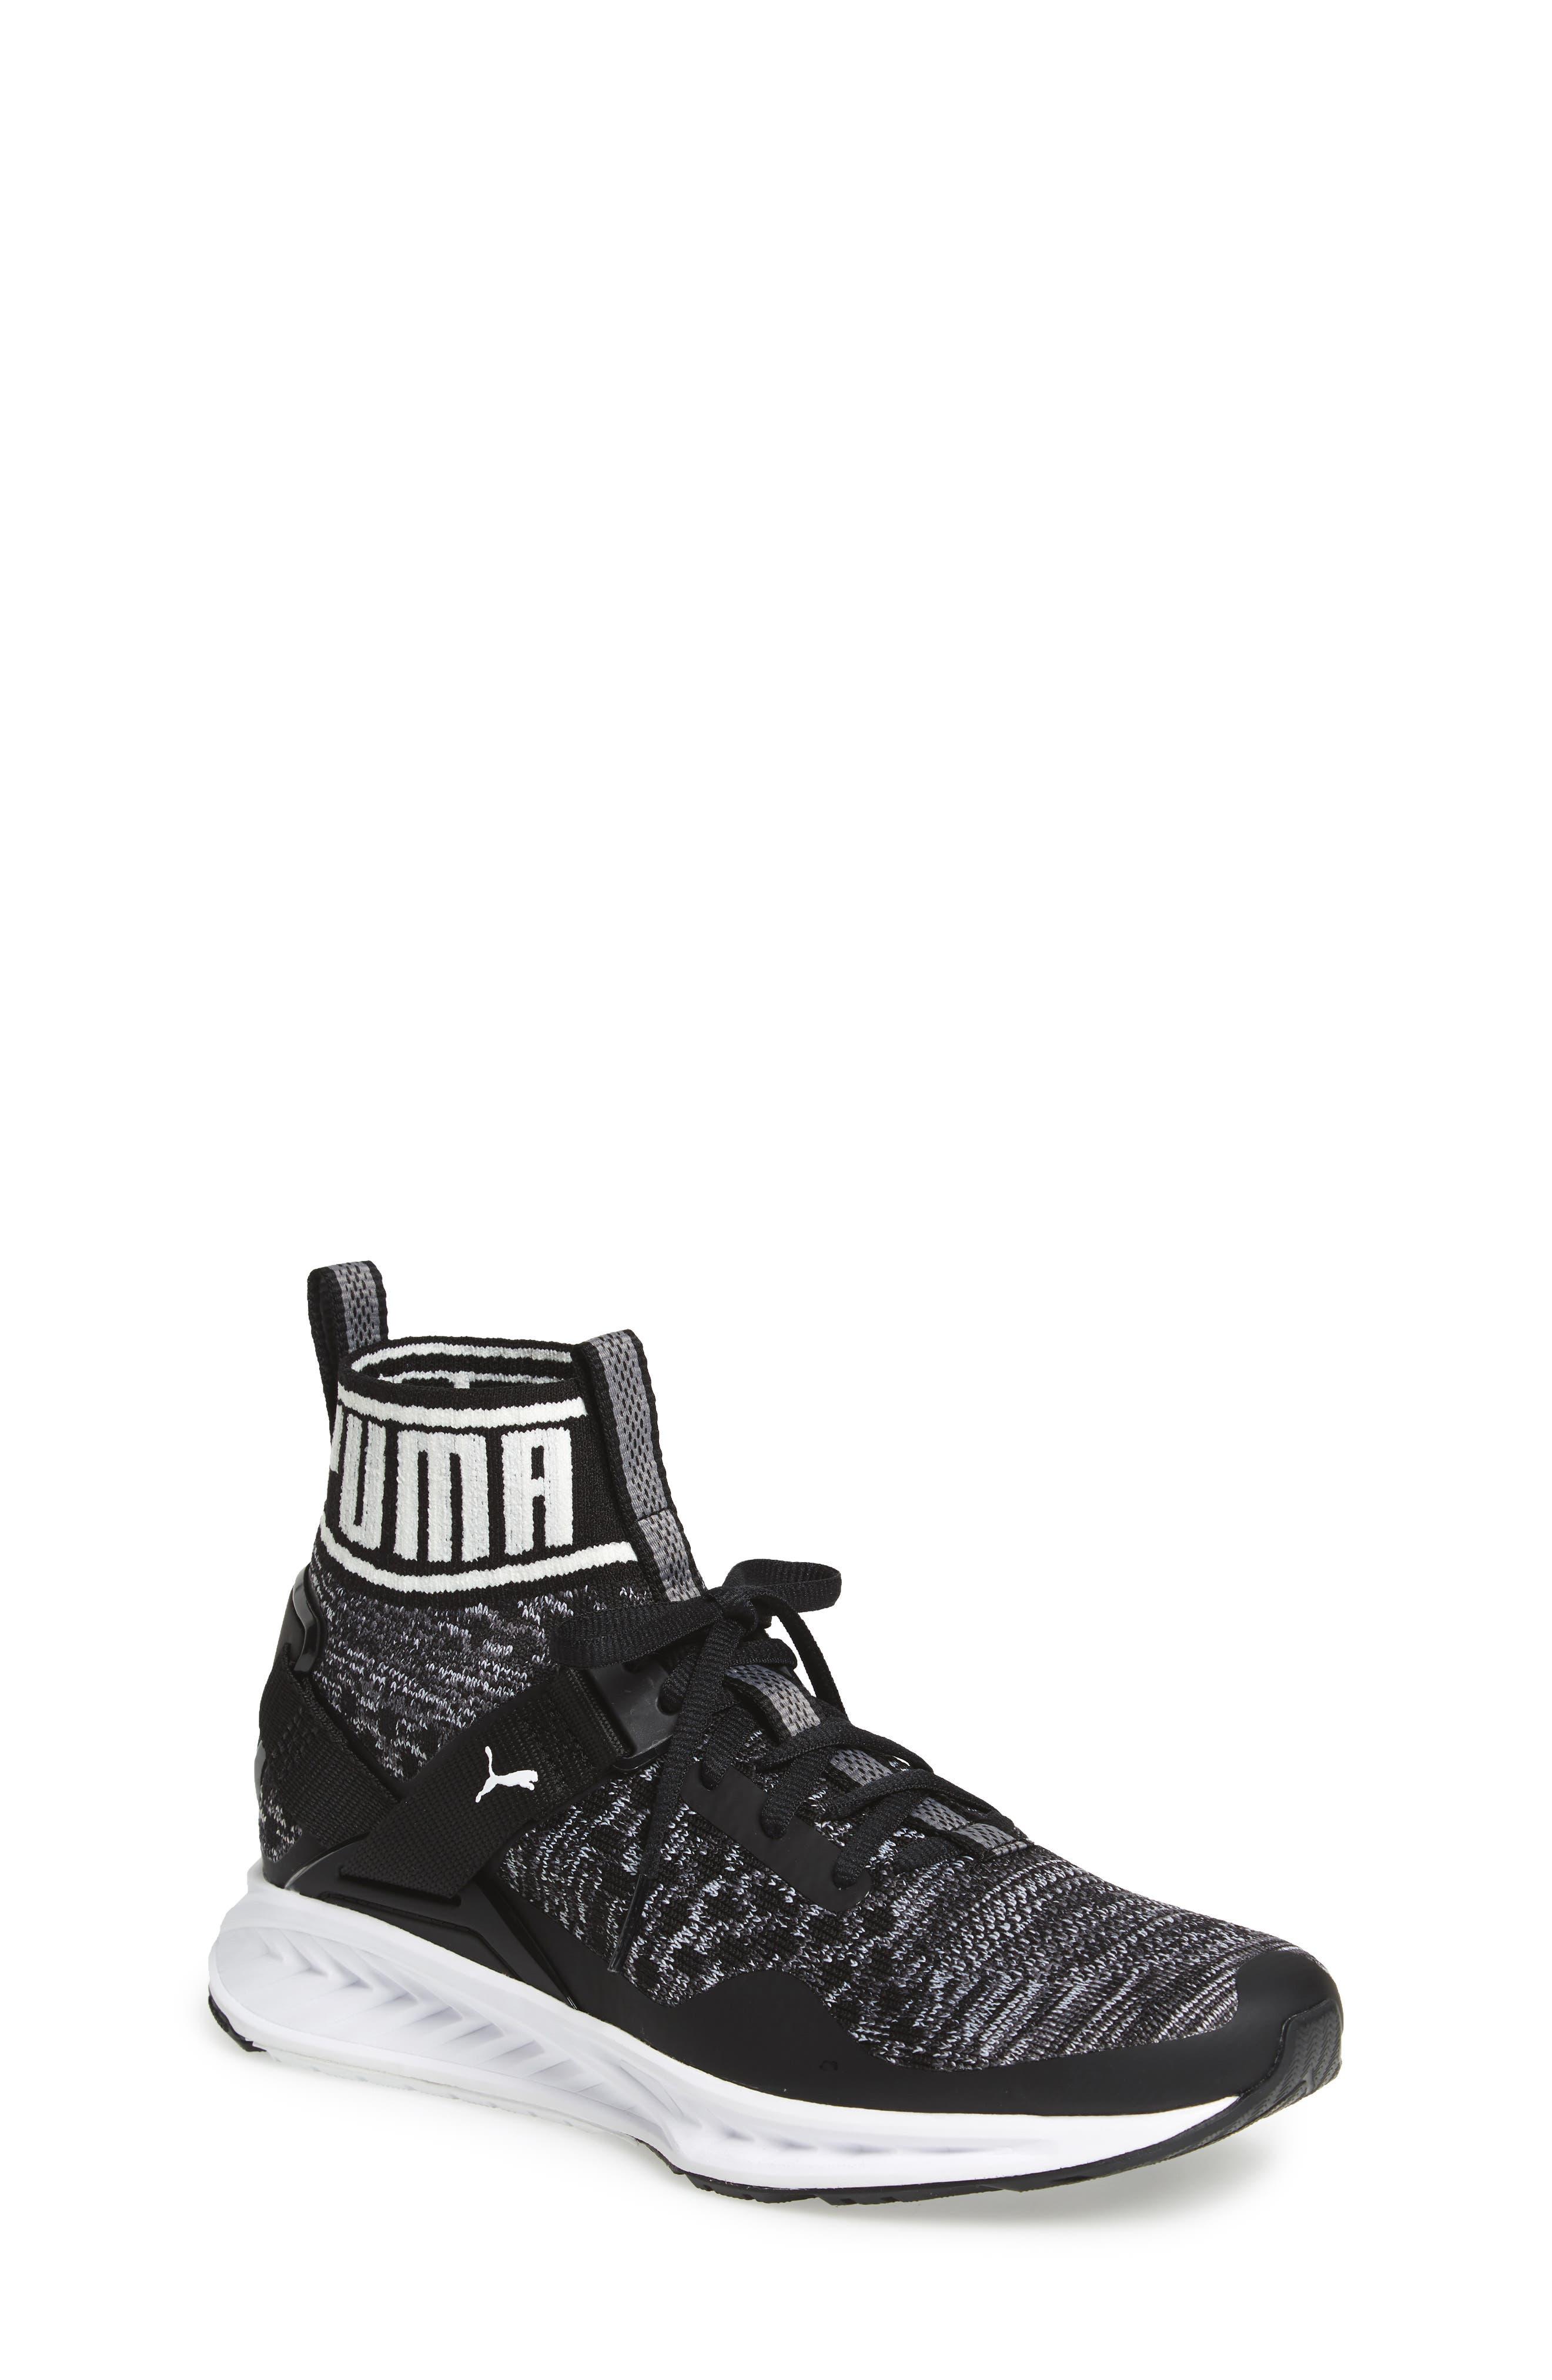 Ignite Evoknit Sneaker,                         Main,                         color, 001